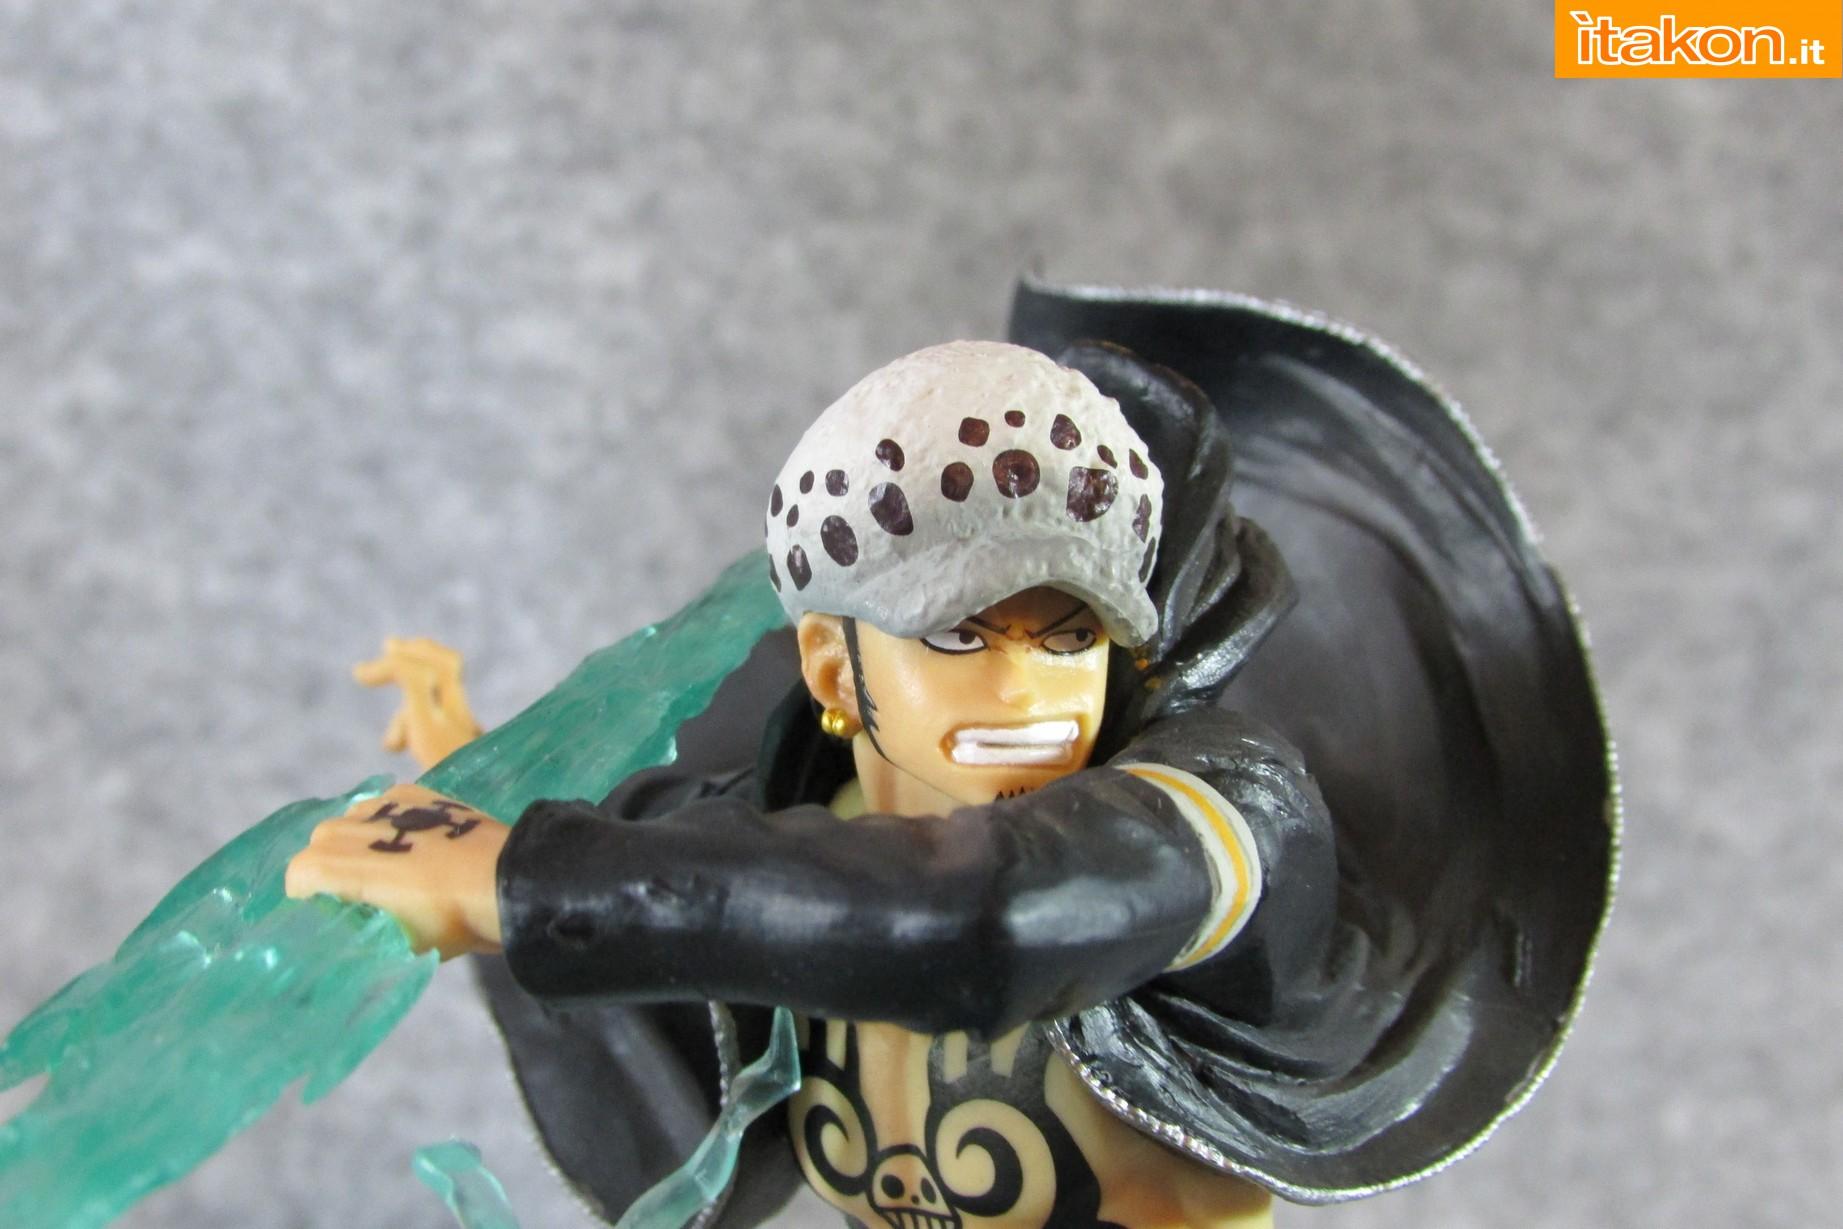 Link a One Piece Trafalgar Law Gamma Knife Figuarts ZERO Chou Gekisen Extra Battle Recensione Review Itakon.it 46